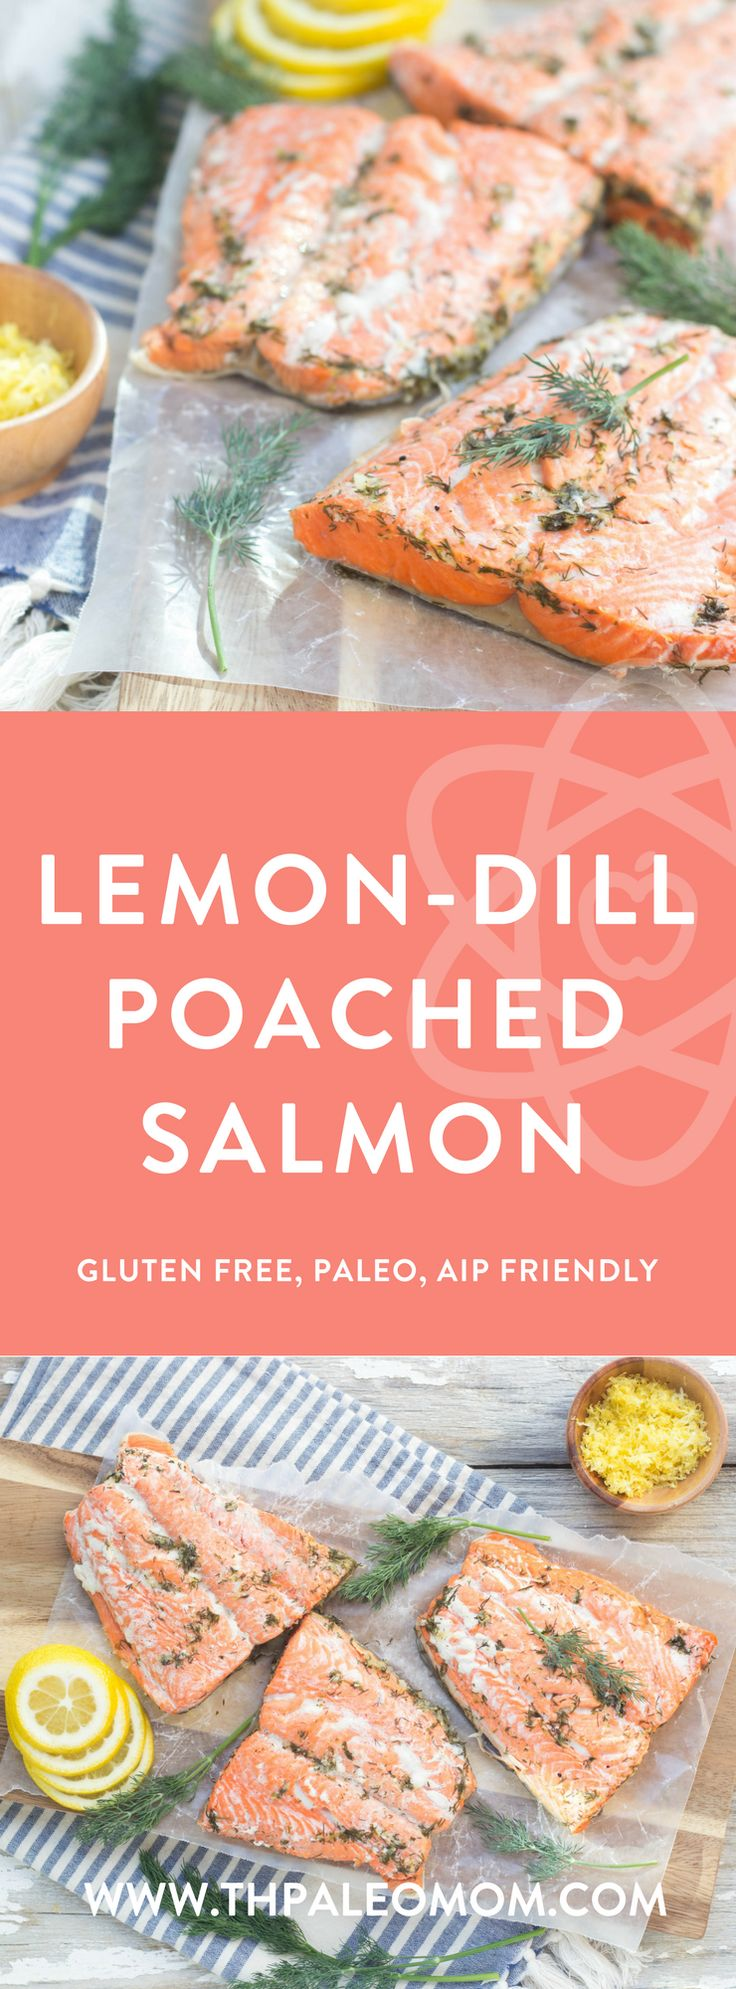 Lemon-Dill Poached Salmon | The Paleo Mom